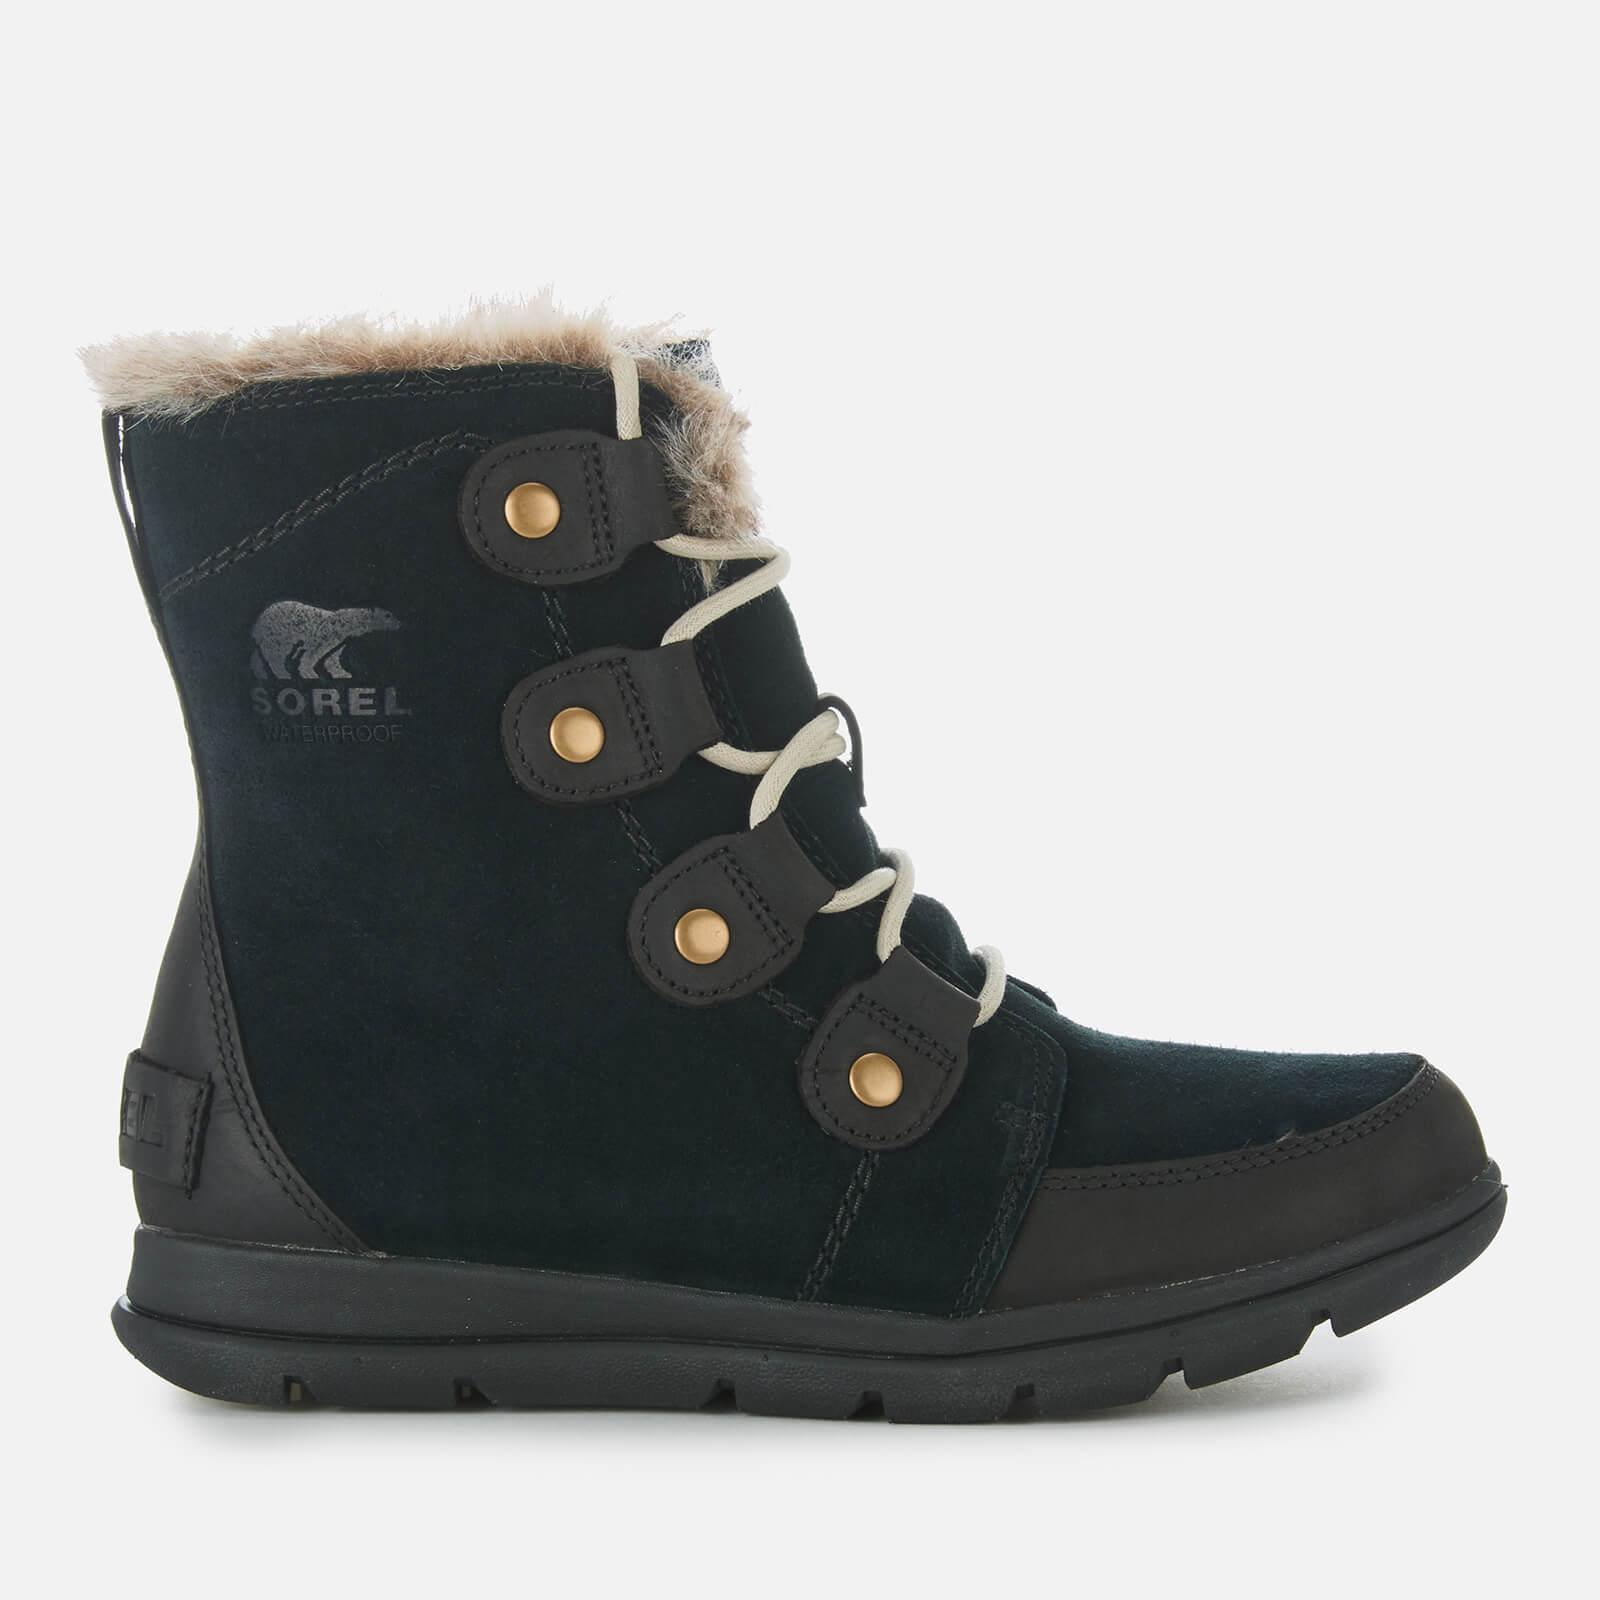 Sorel Women's Explorer Joan Hiker Style Boots - Black Dark Stone - UK 6